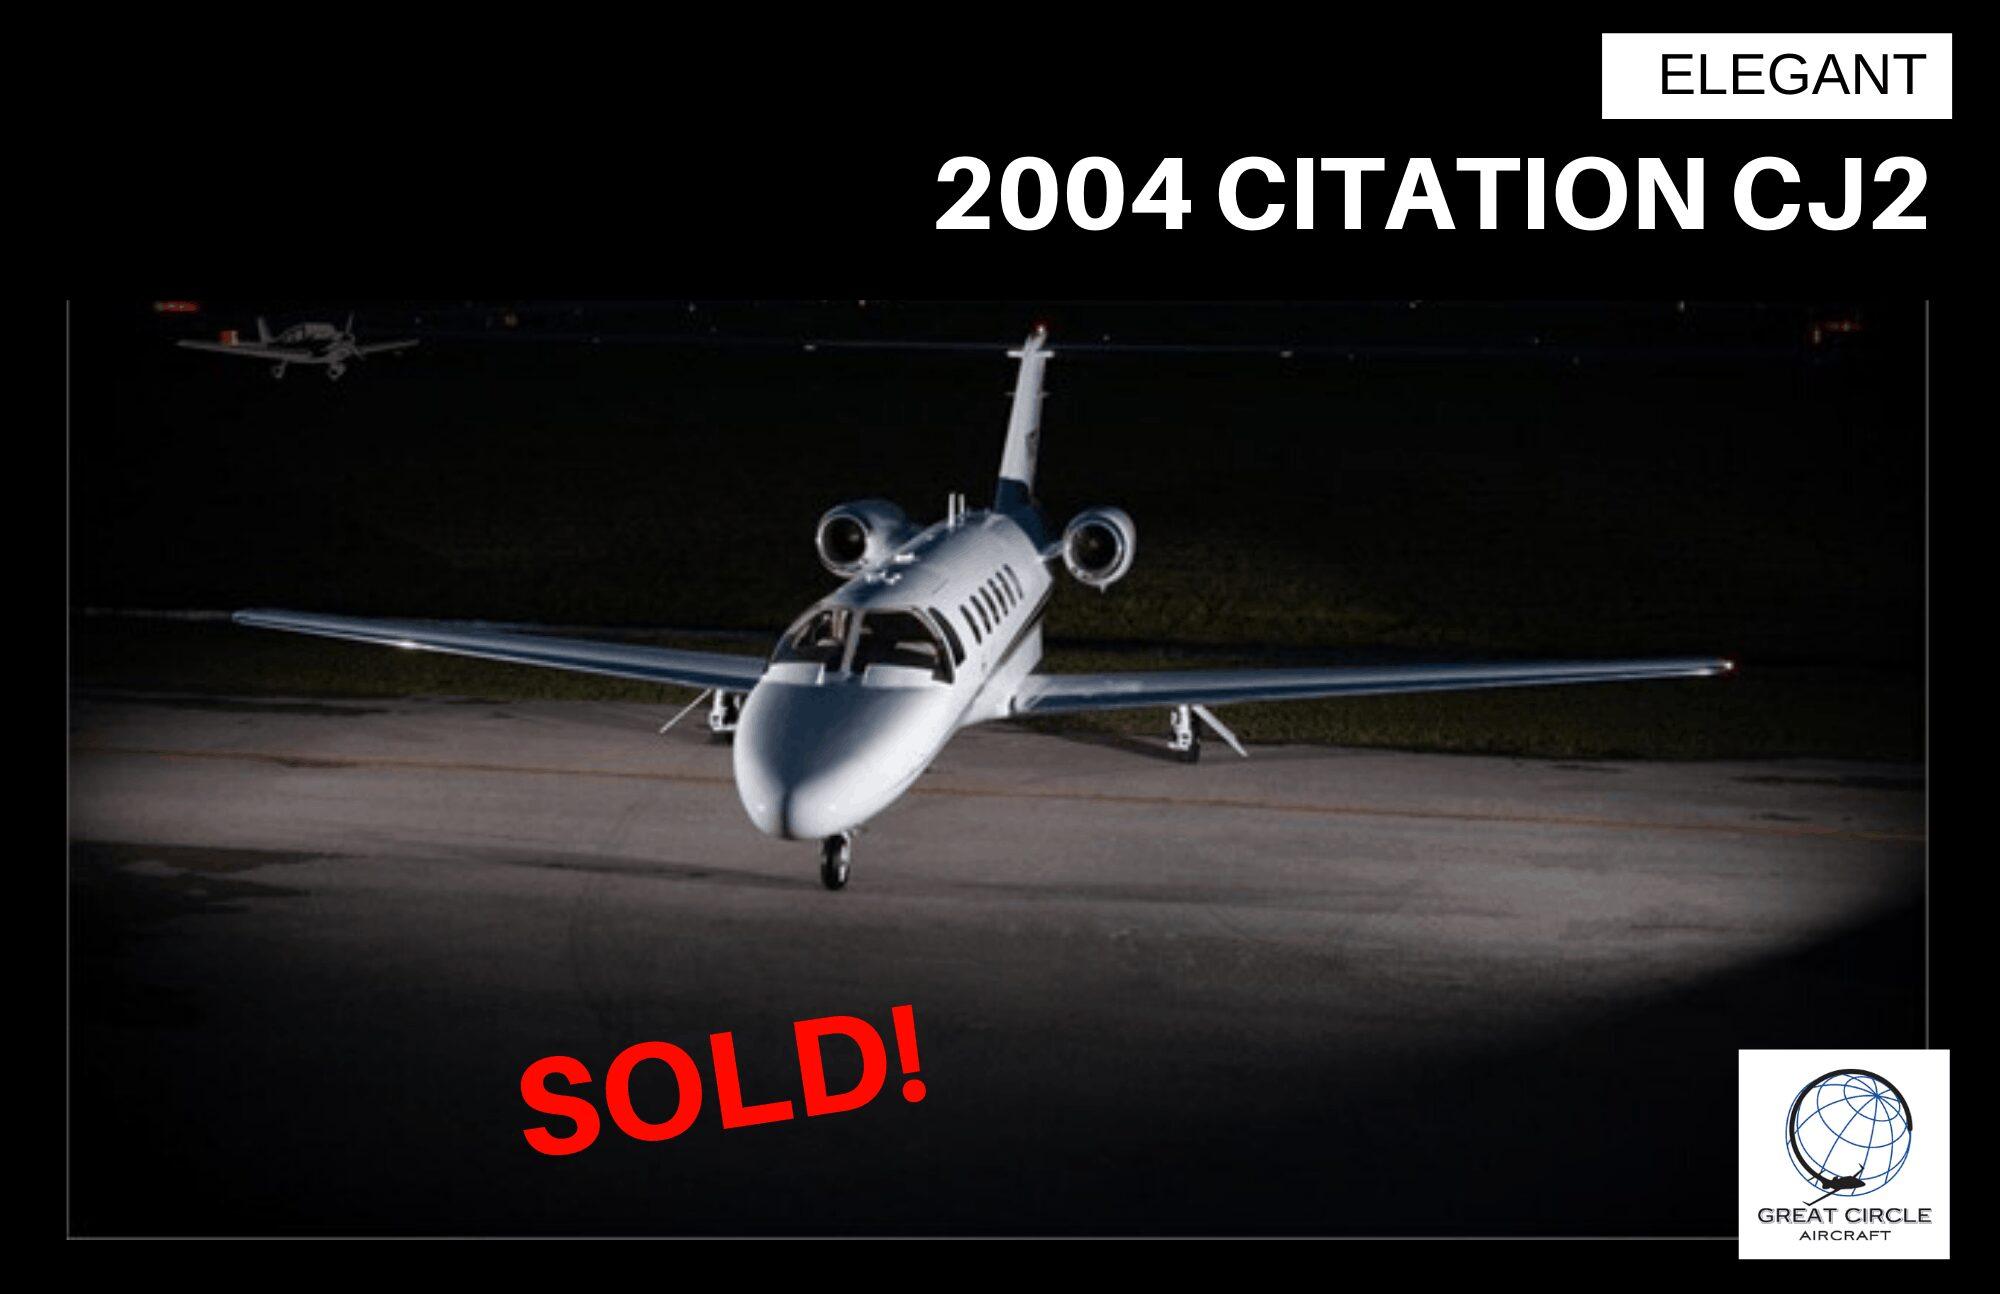 2004 Citation CJ2 – Sold!